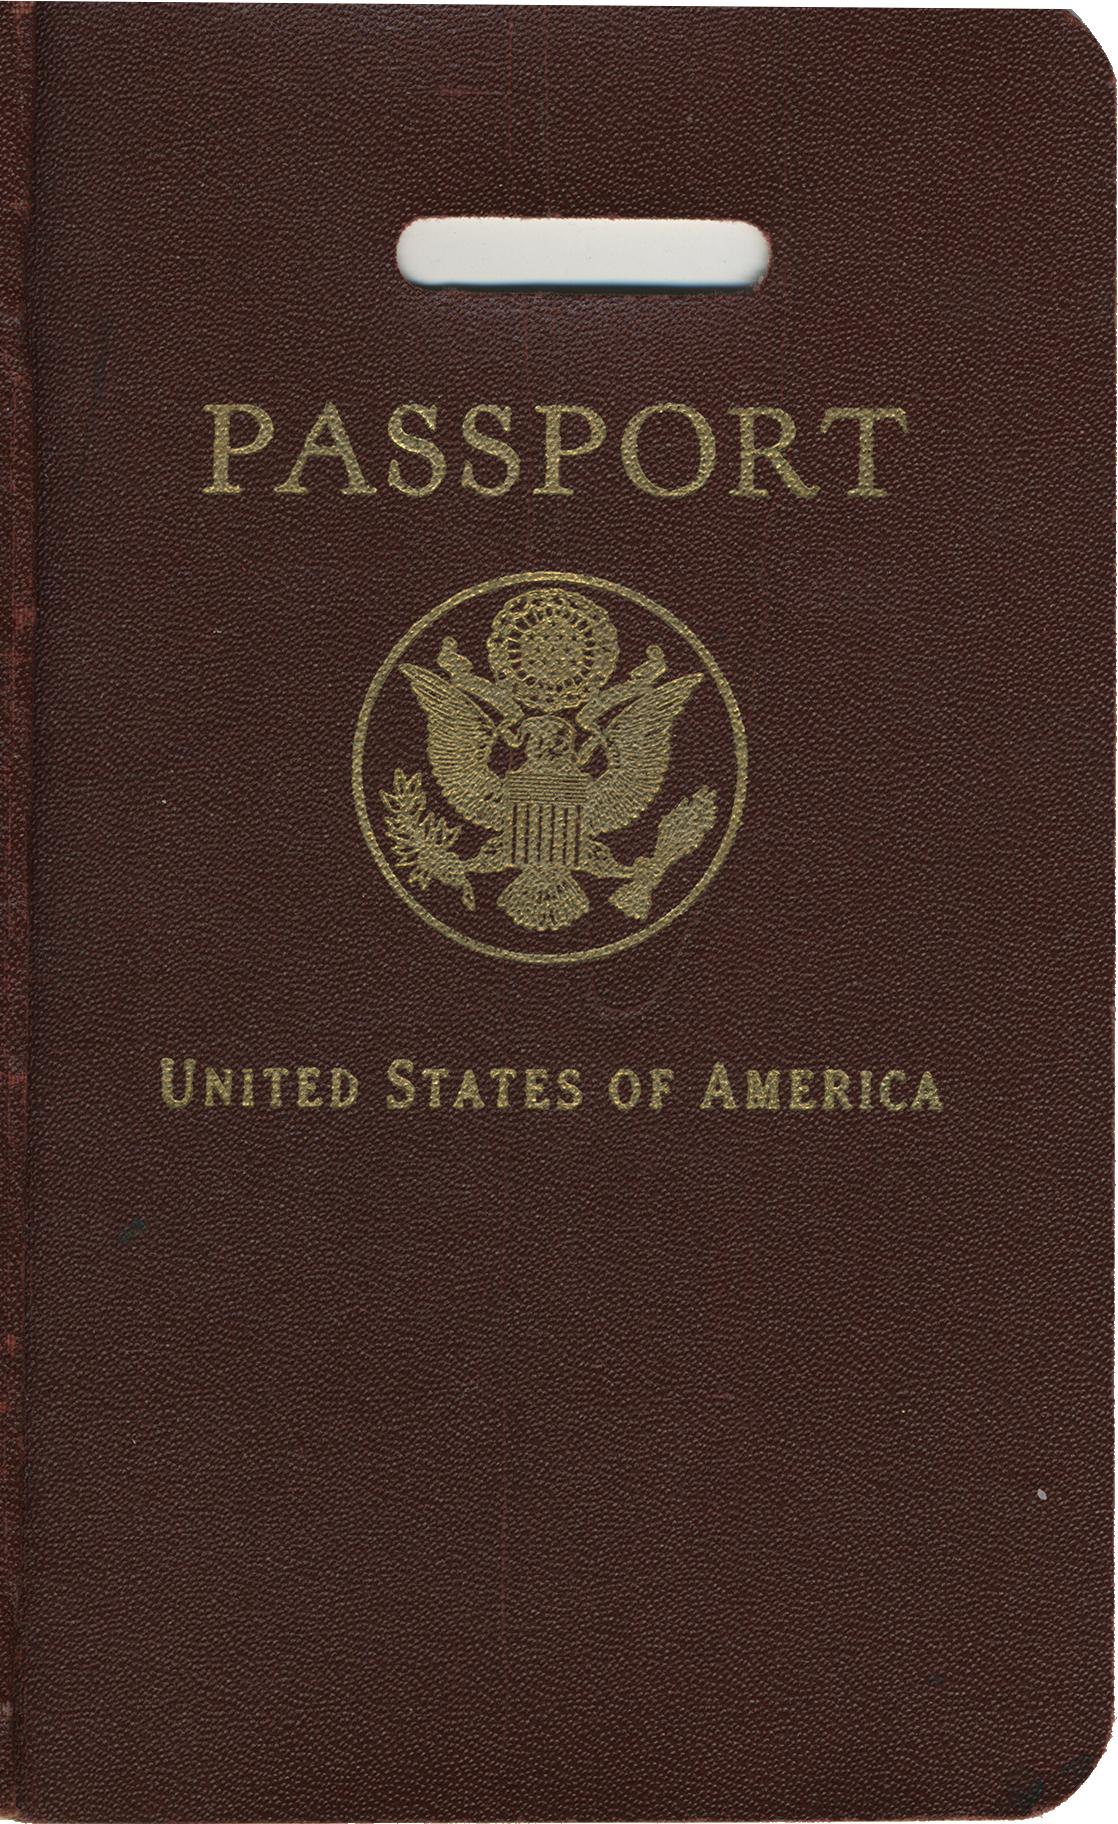 Passport01_PTF_Archive_1466A.jpg